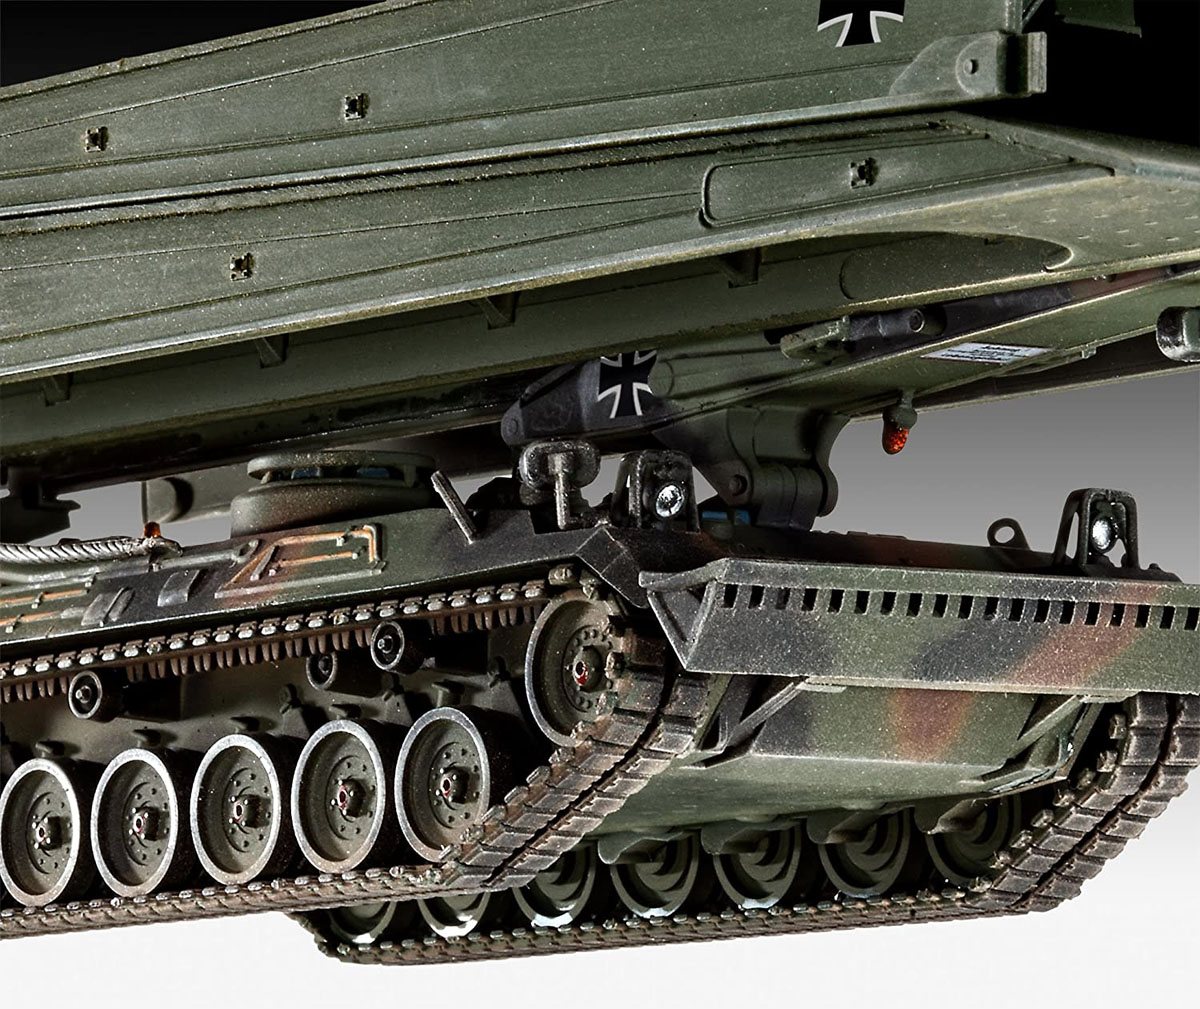 Leopard 1A5 + Biber - 1/72 - Revell 03307  - BLIMPS COMÉRCIO ELETRÔNICO